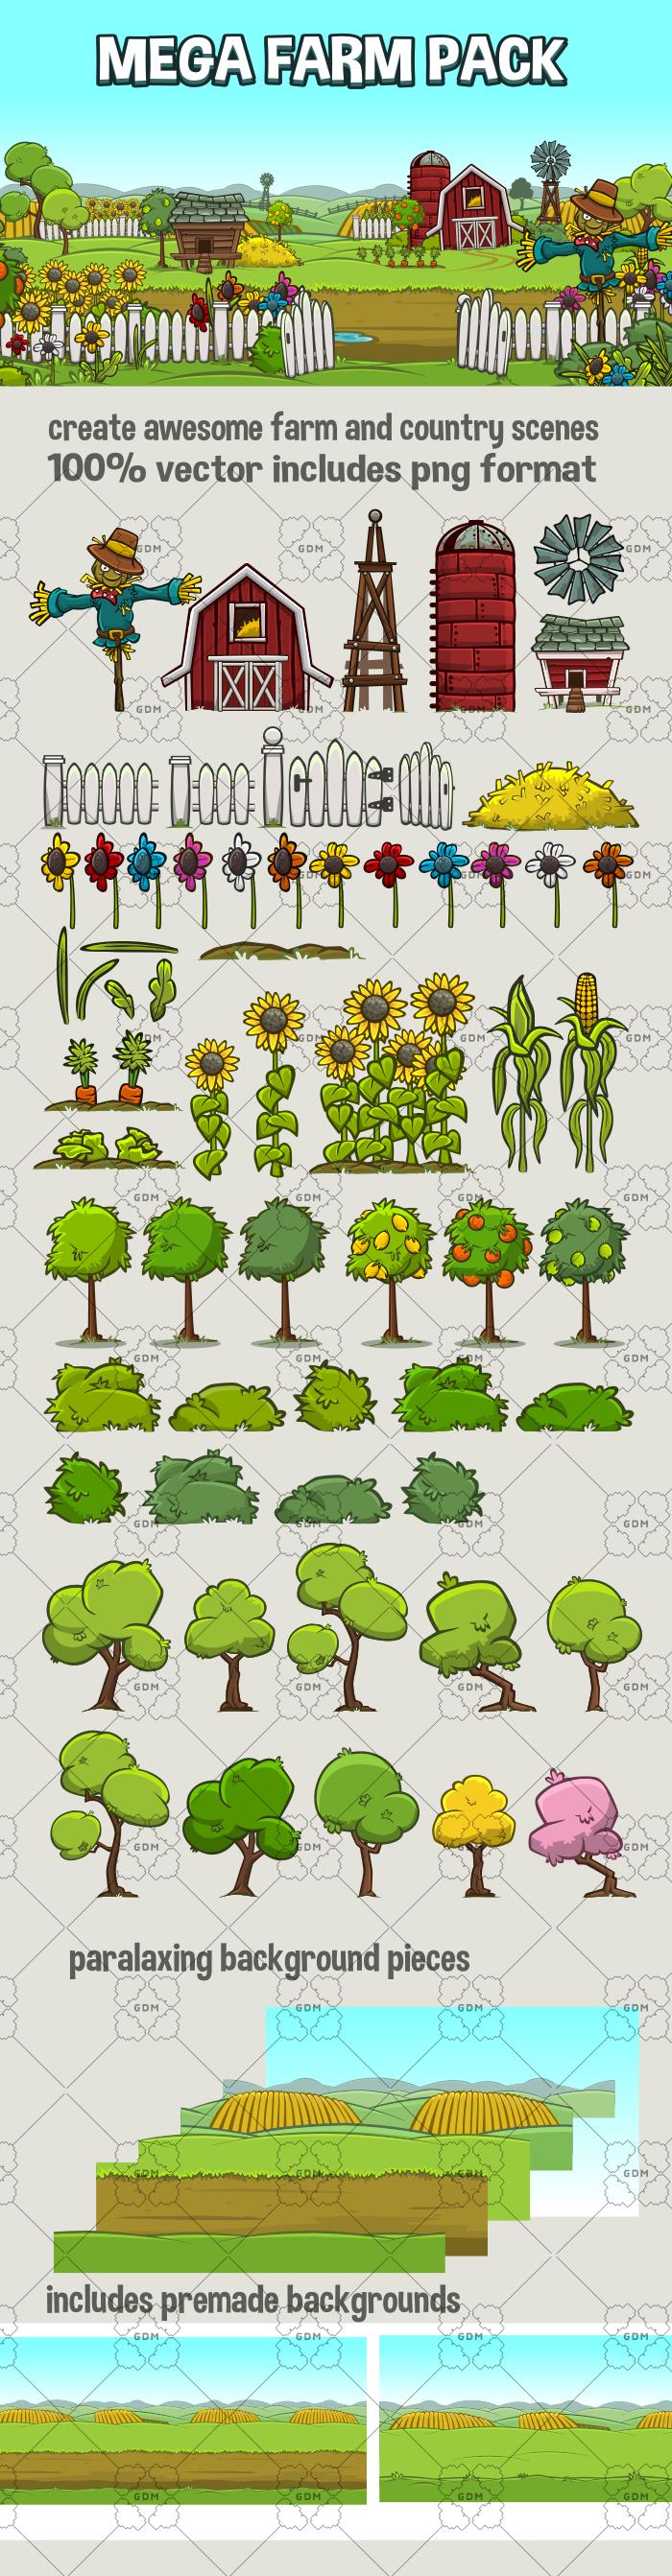 Mega farm scene creation pack